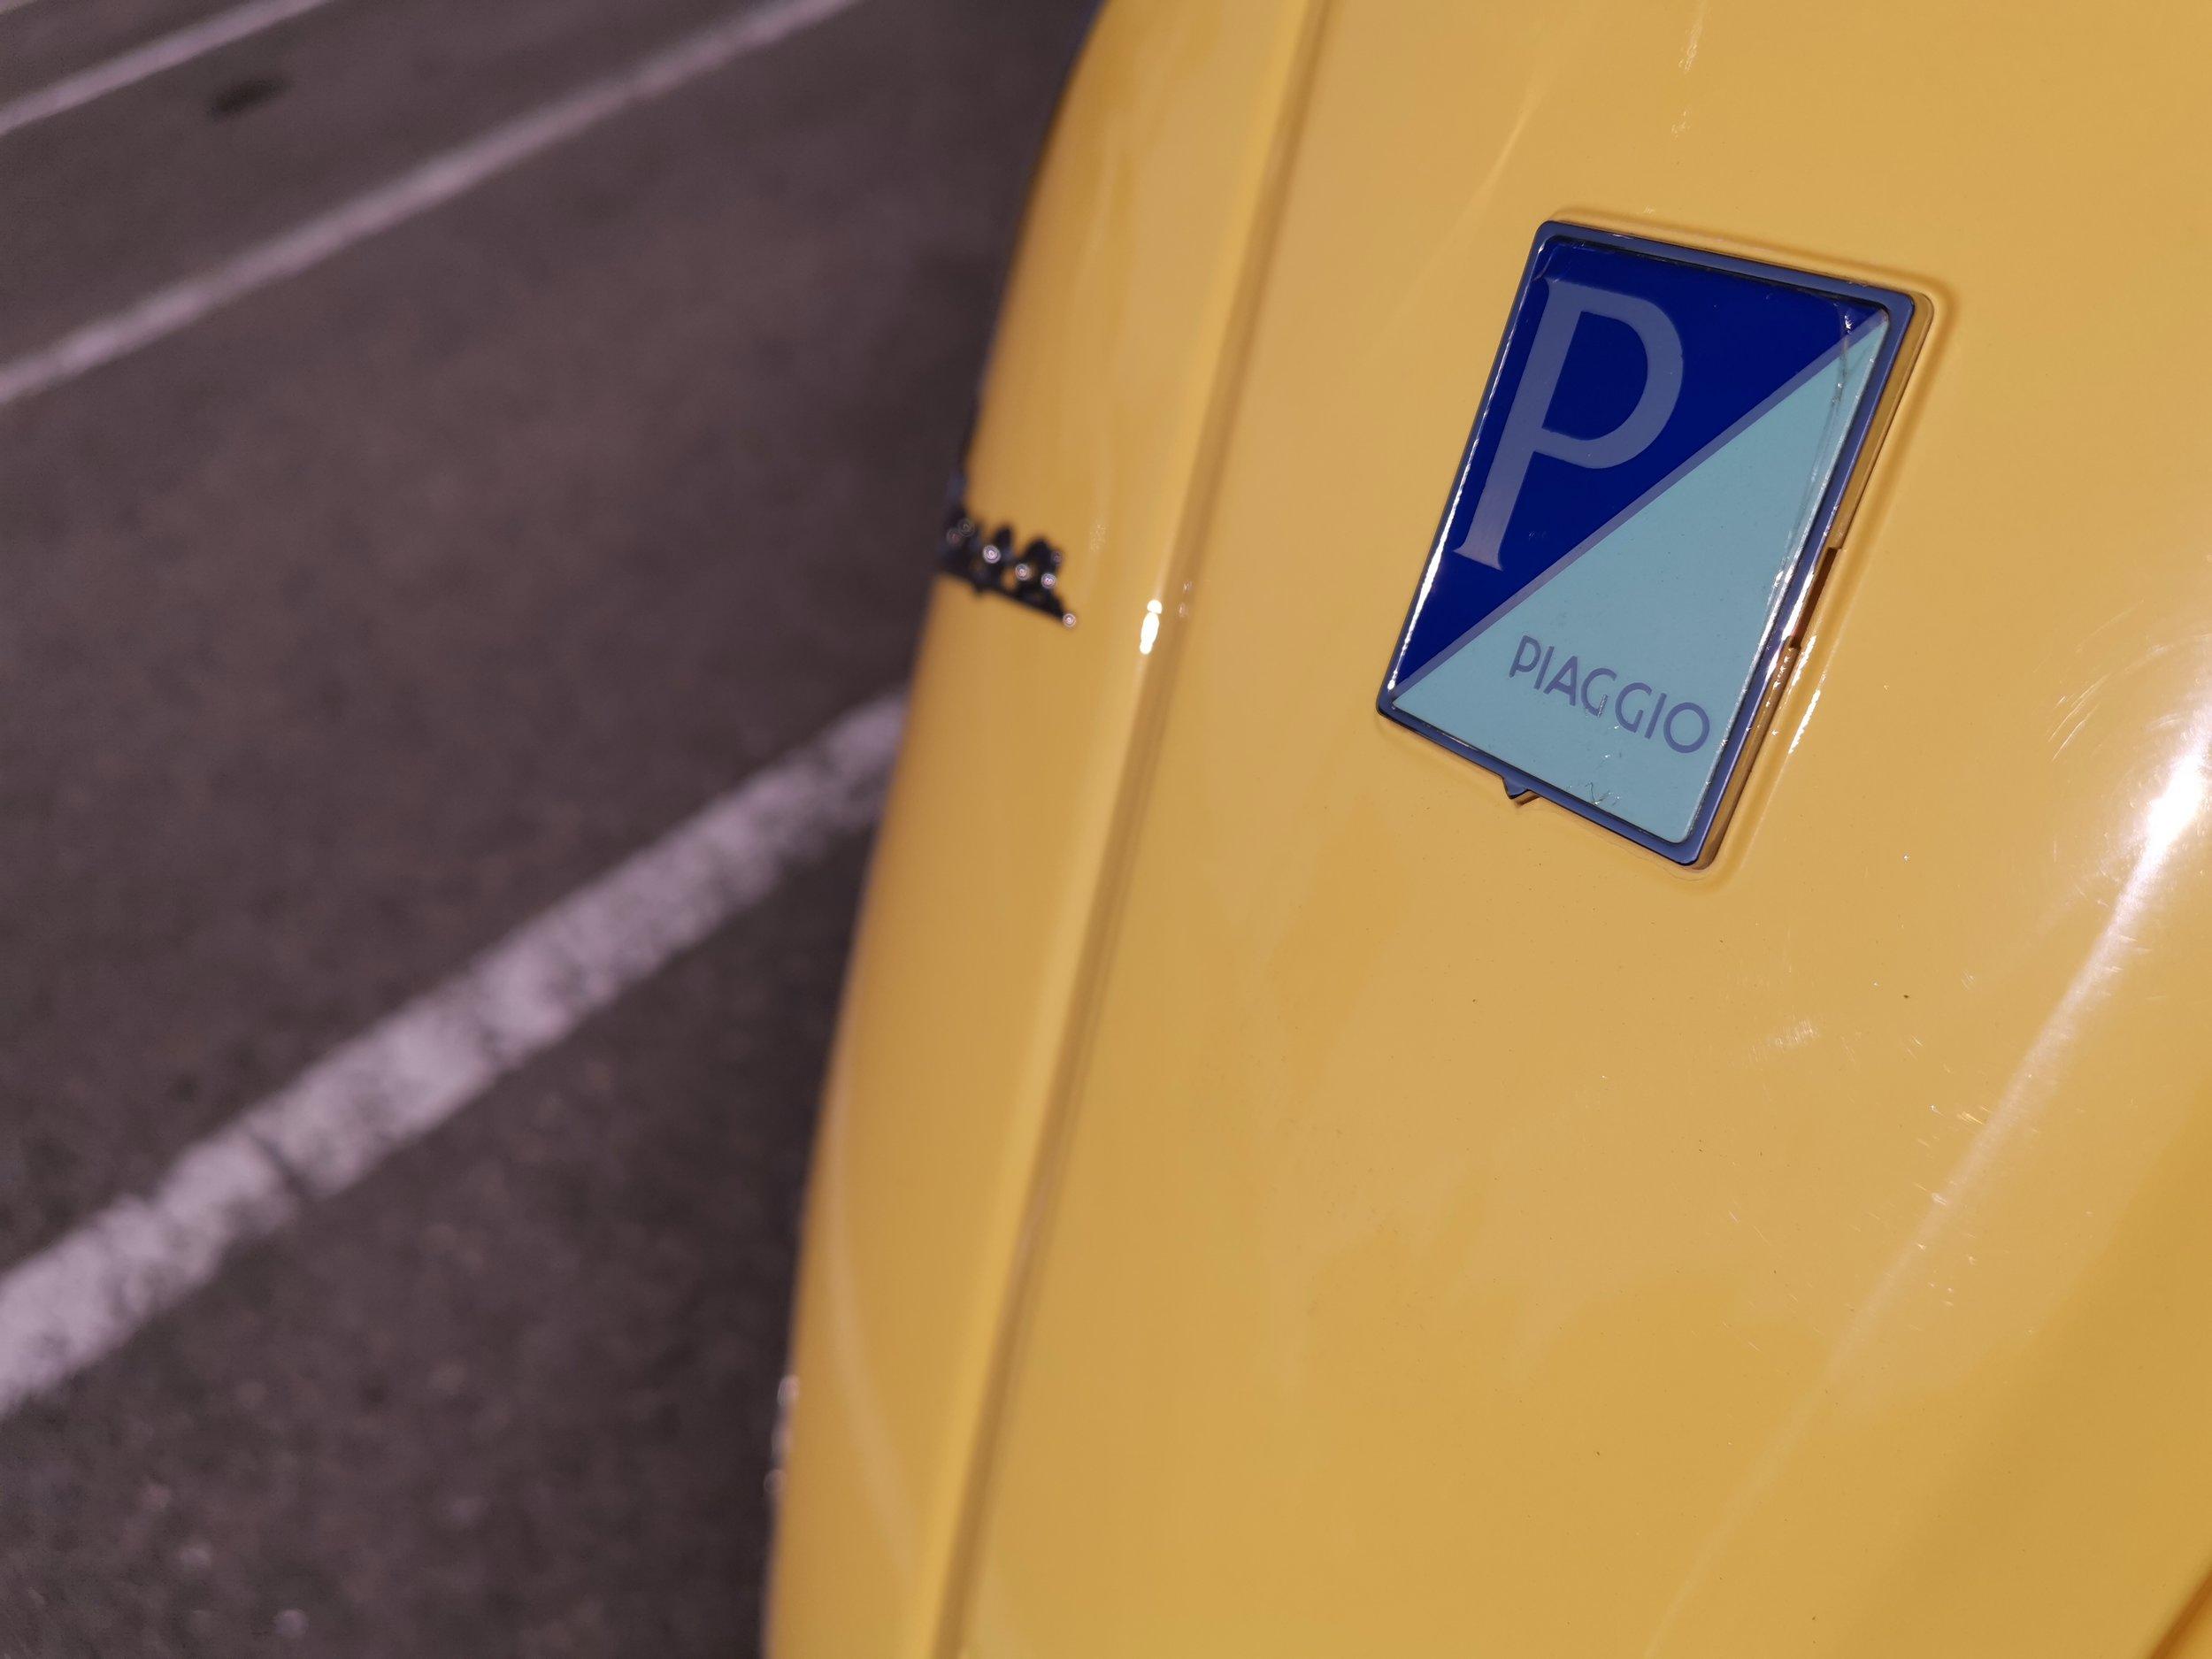 Piaggio社のバッジ